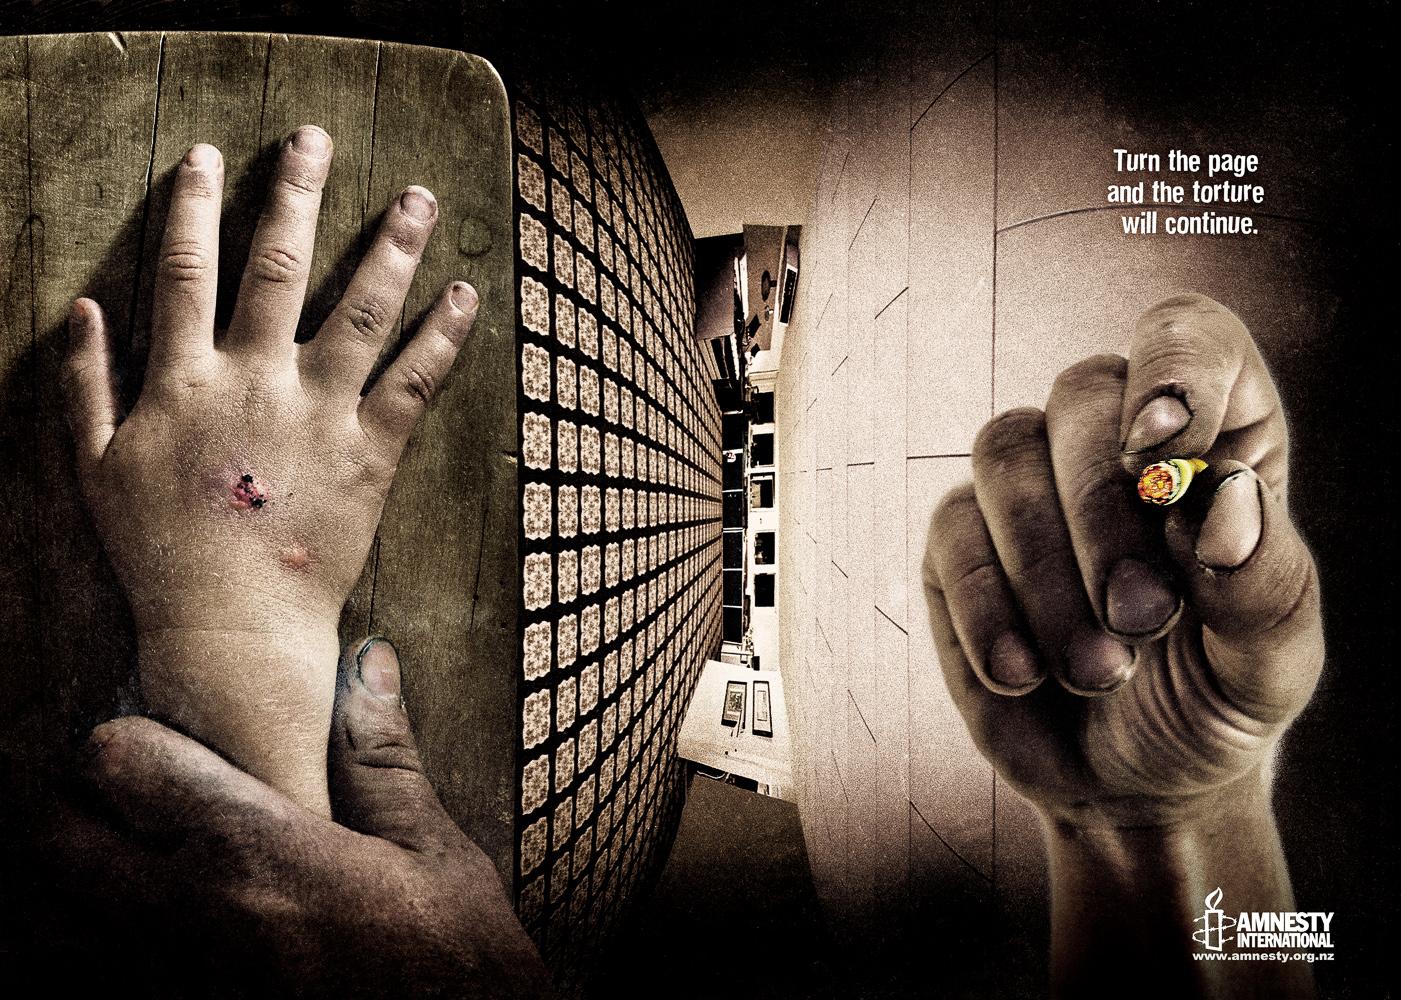 amnesty-internationall-Wellington-photographer-Paul-Fisher.jpg